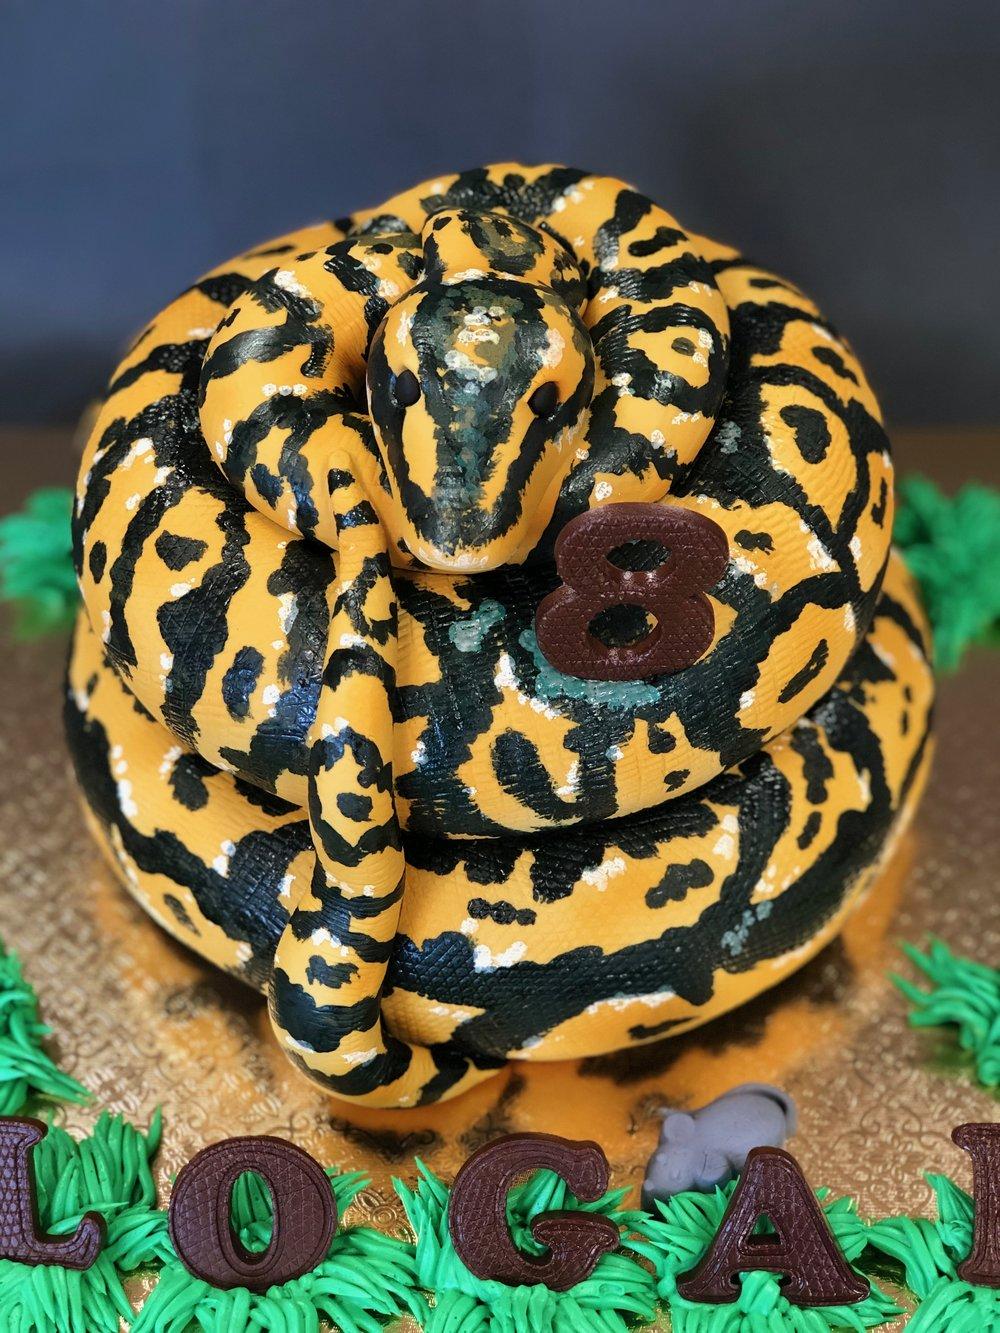 3D Boa Python Birthday Cake NJ